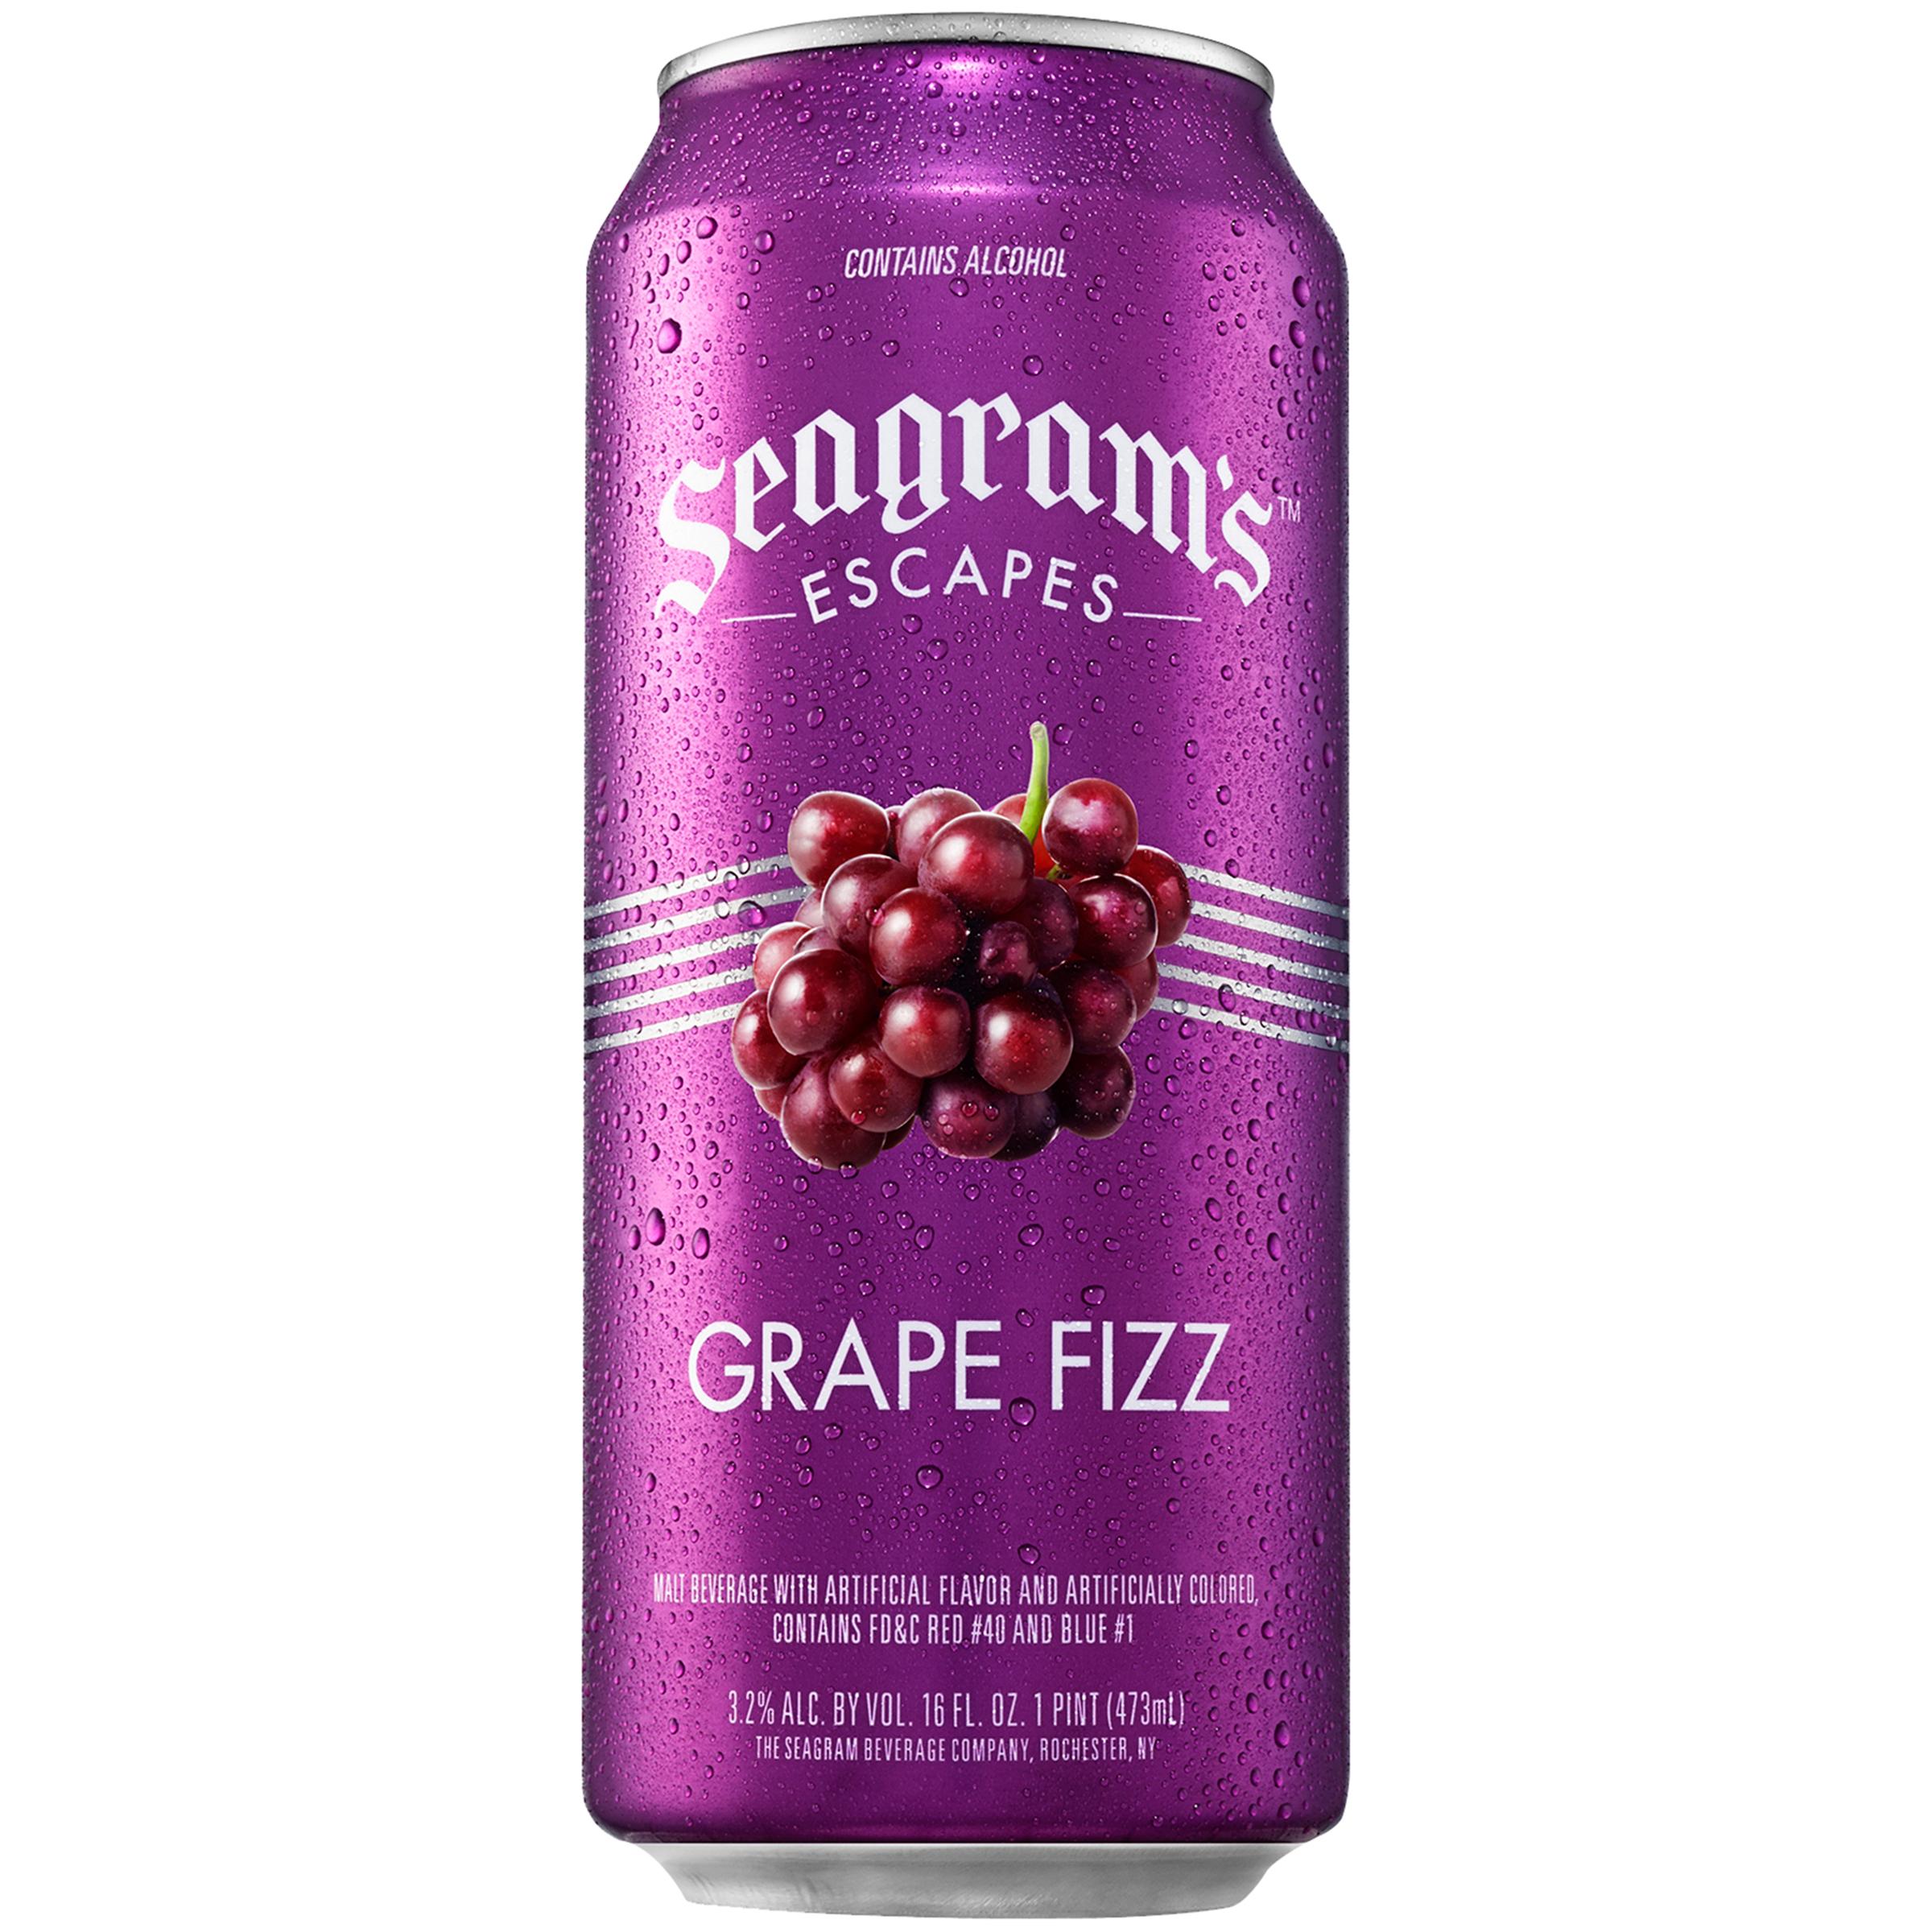 Seagram's Escapes Grape Fizz Cocktail, 16 fl oz